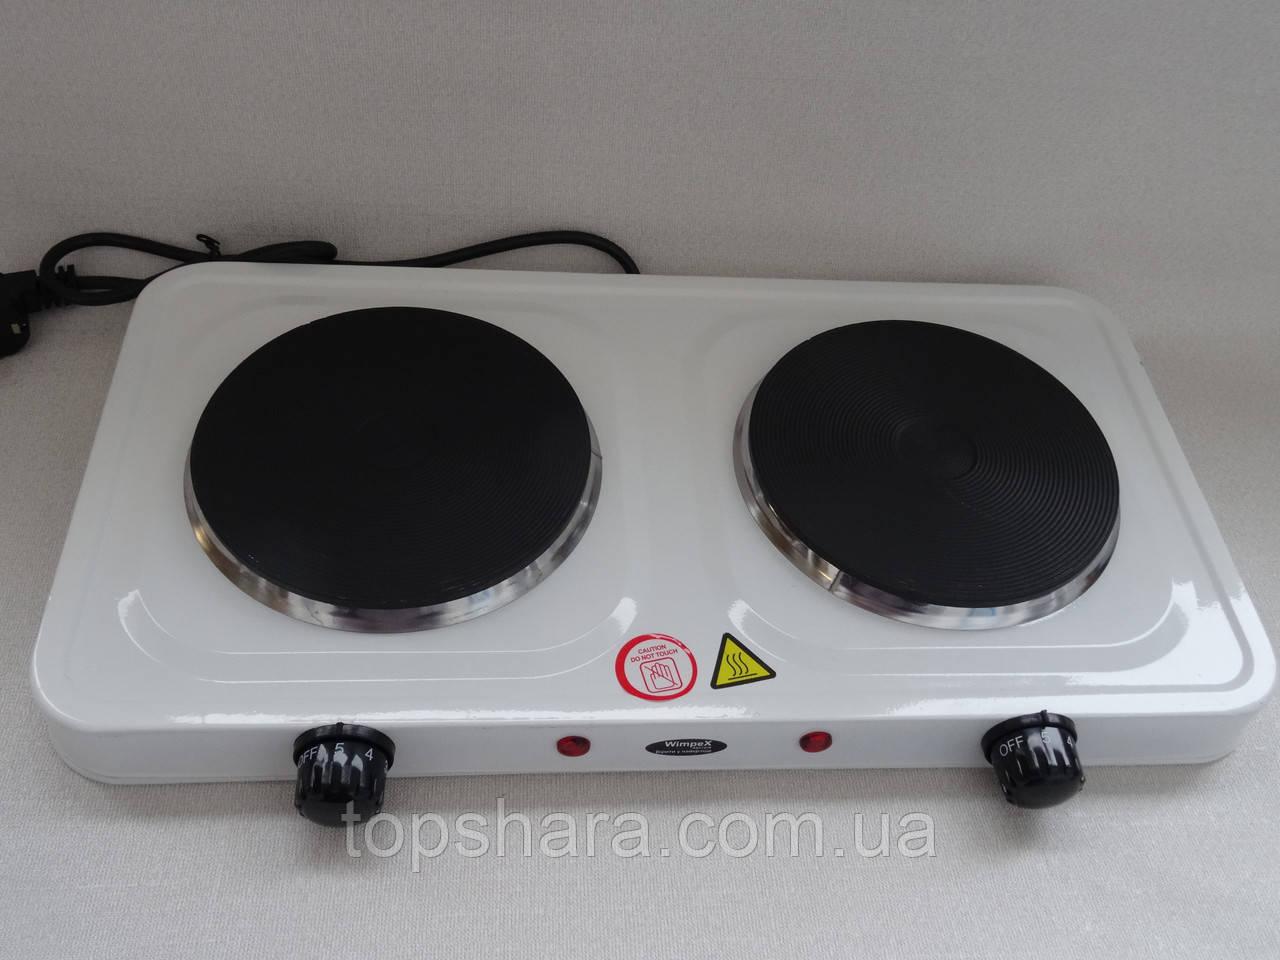 Электроплита кухонная Wimpex WX-200A-HP настольная двухкомфорочная 2000W